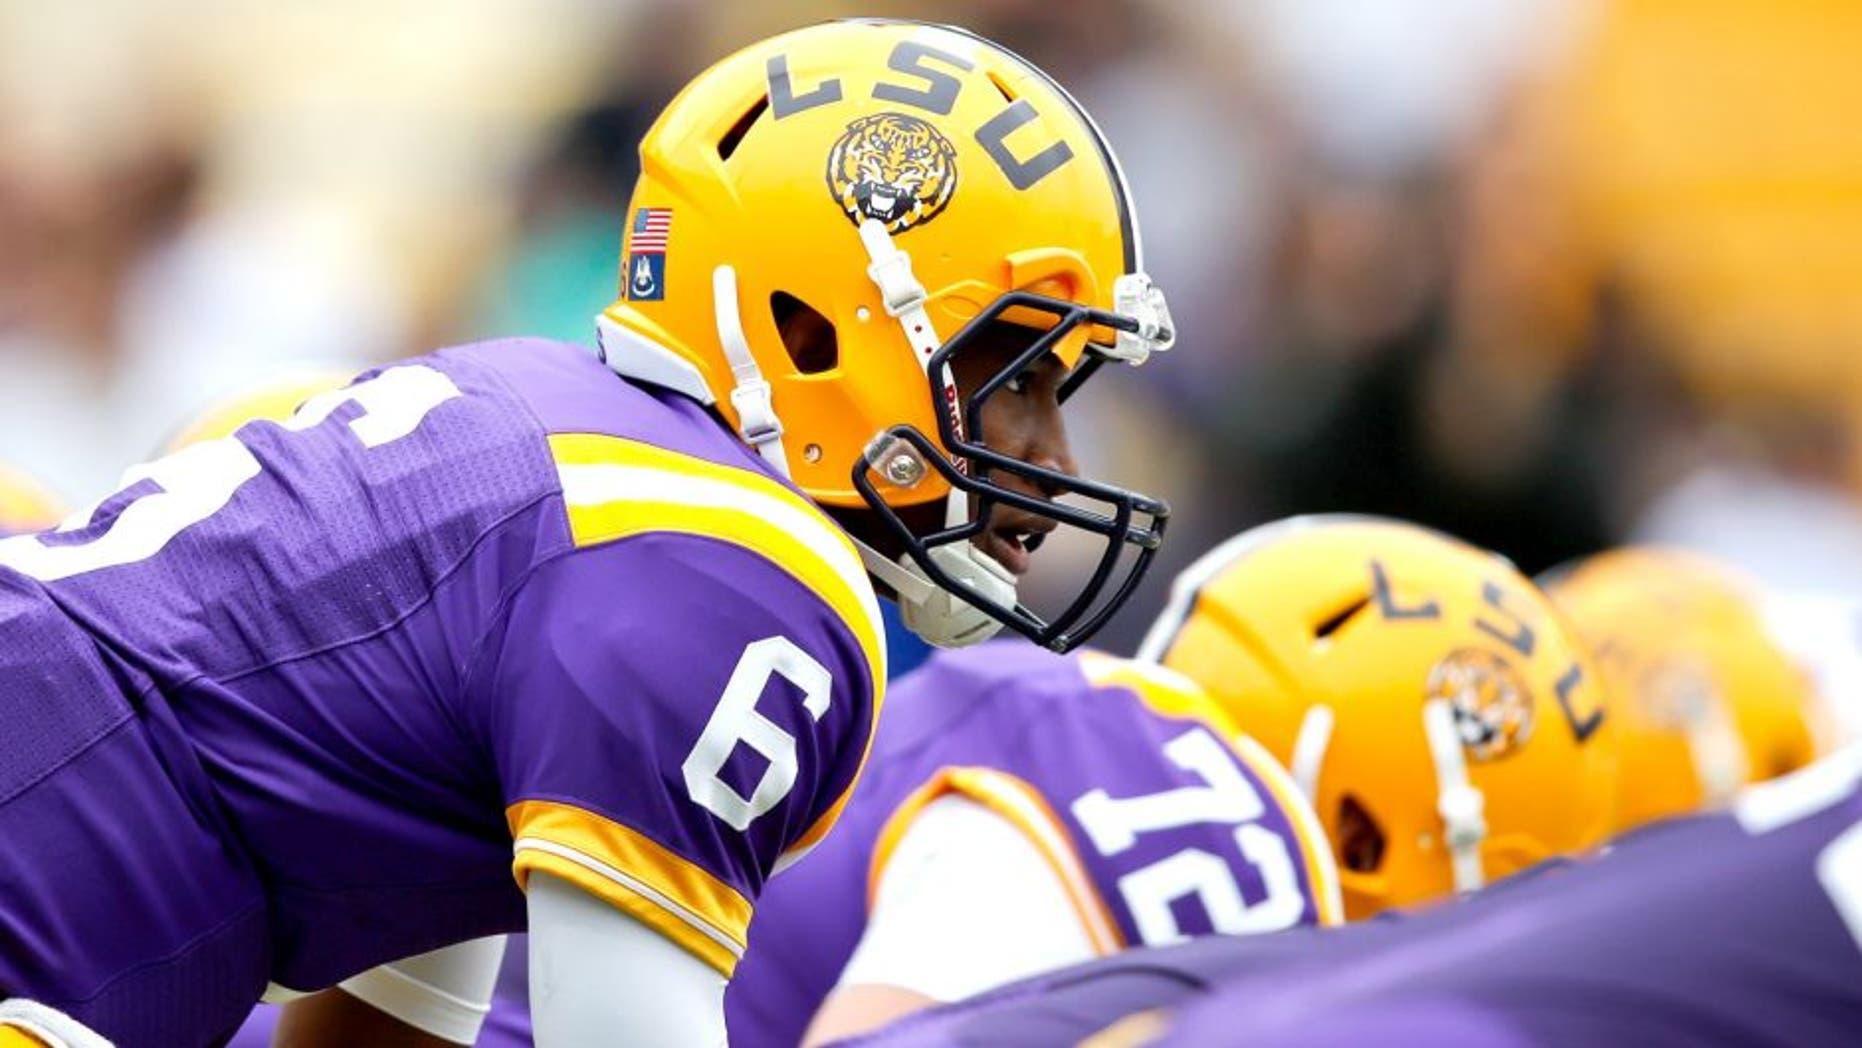 Apr 5, 2014; Baton Rouge, LA, USA; LSU Tigers quarterback Brandon Harris (6) during the 2014 spring game at Tiger Stadium. Mandatory Credit: Derick E. Hingle-USA TODAY Sports